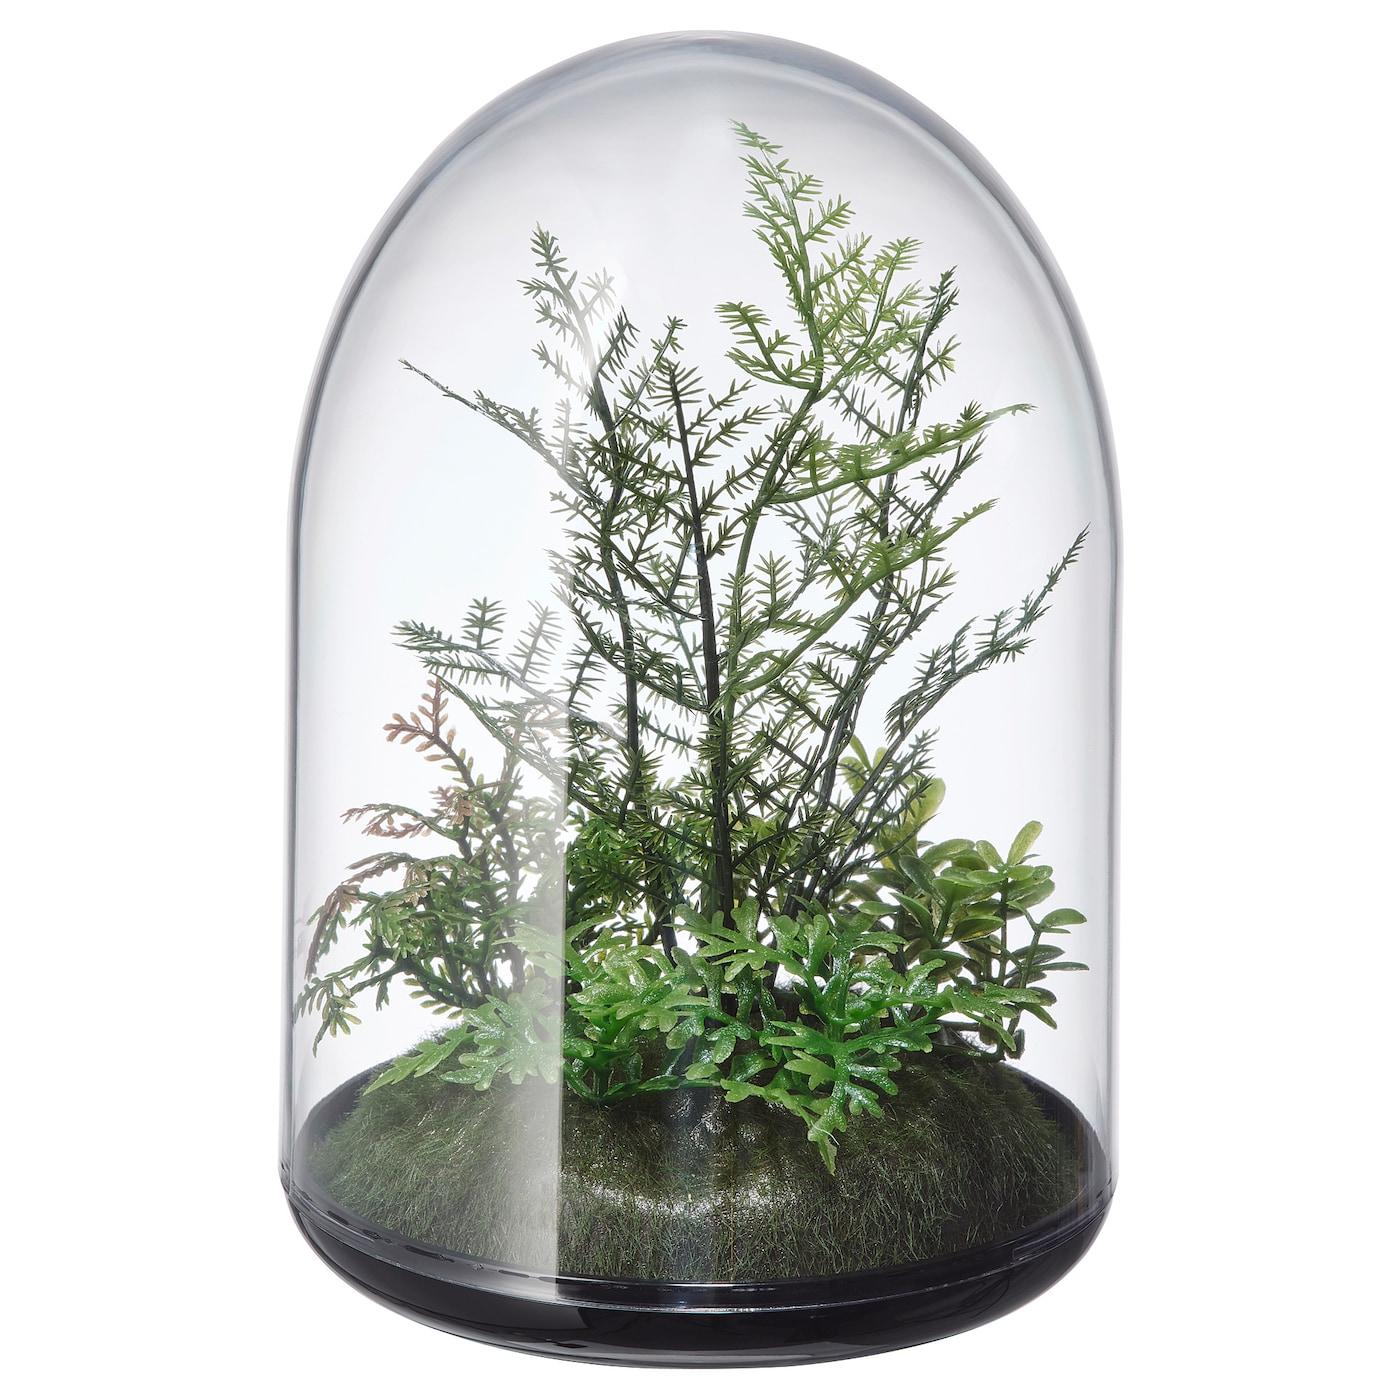 Invandig Artificial Terrarium Dome Ikea